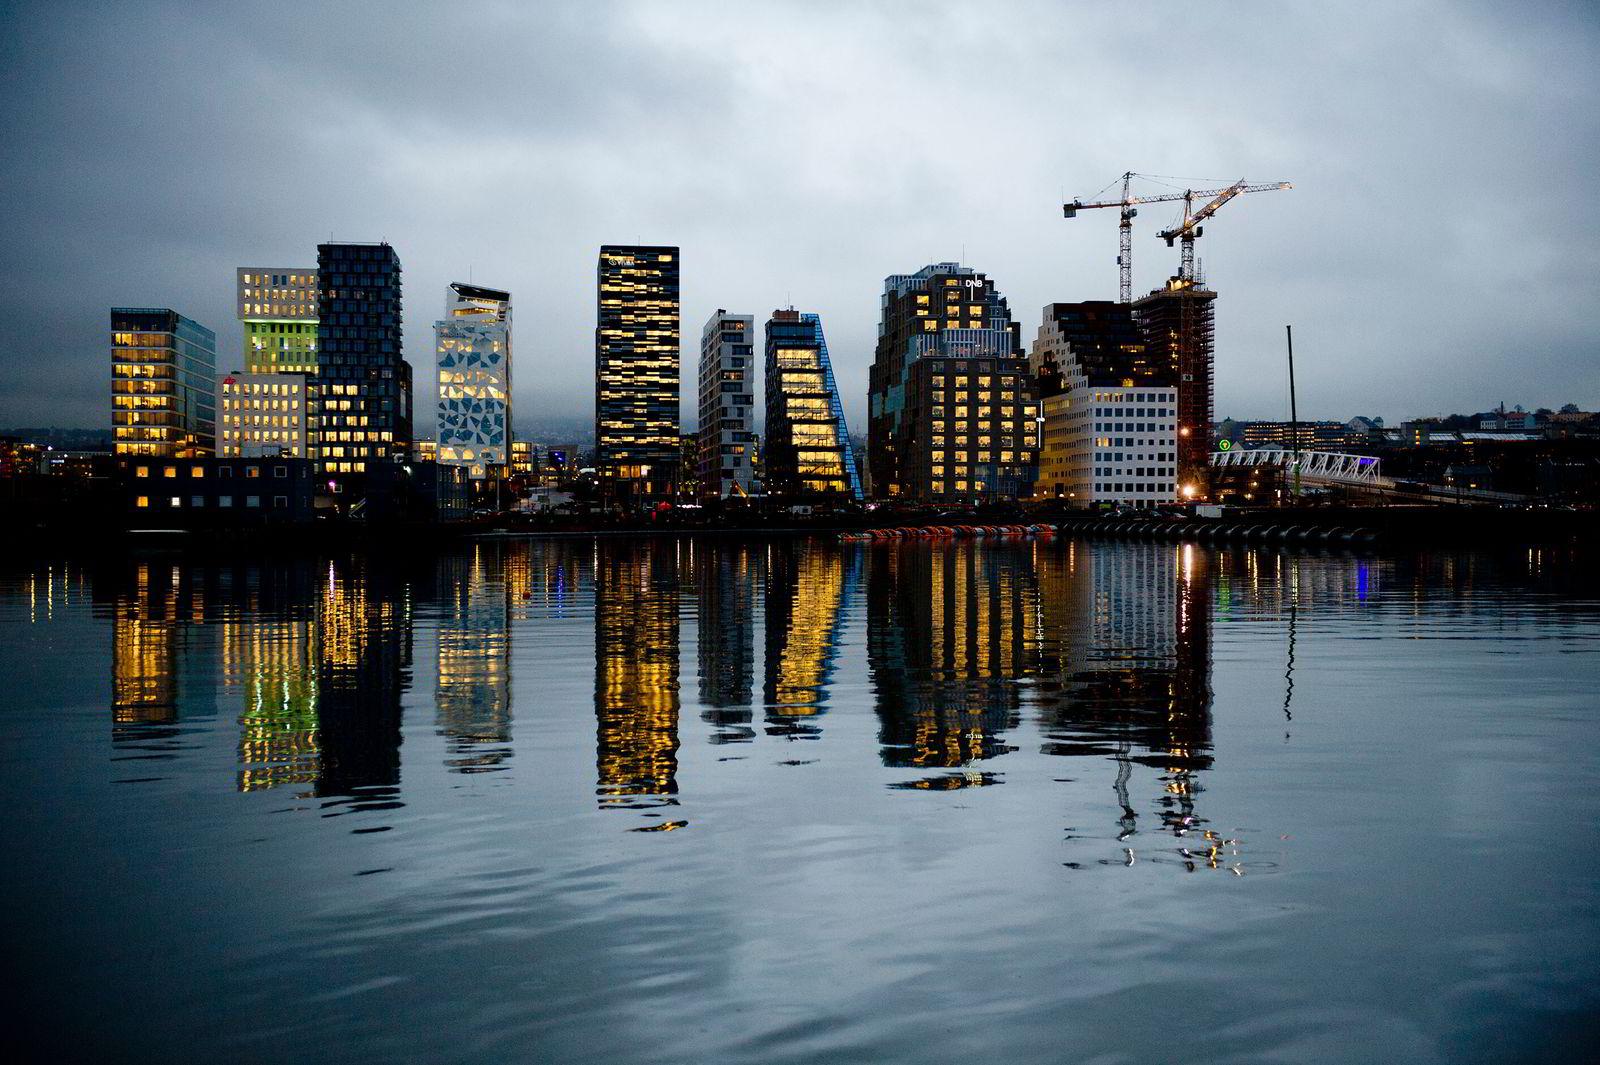 Boligprisene i Oslo stiger også fordi folk vil ha